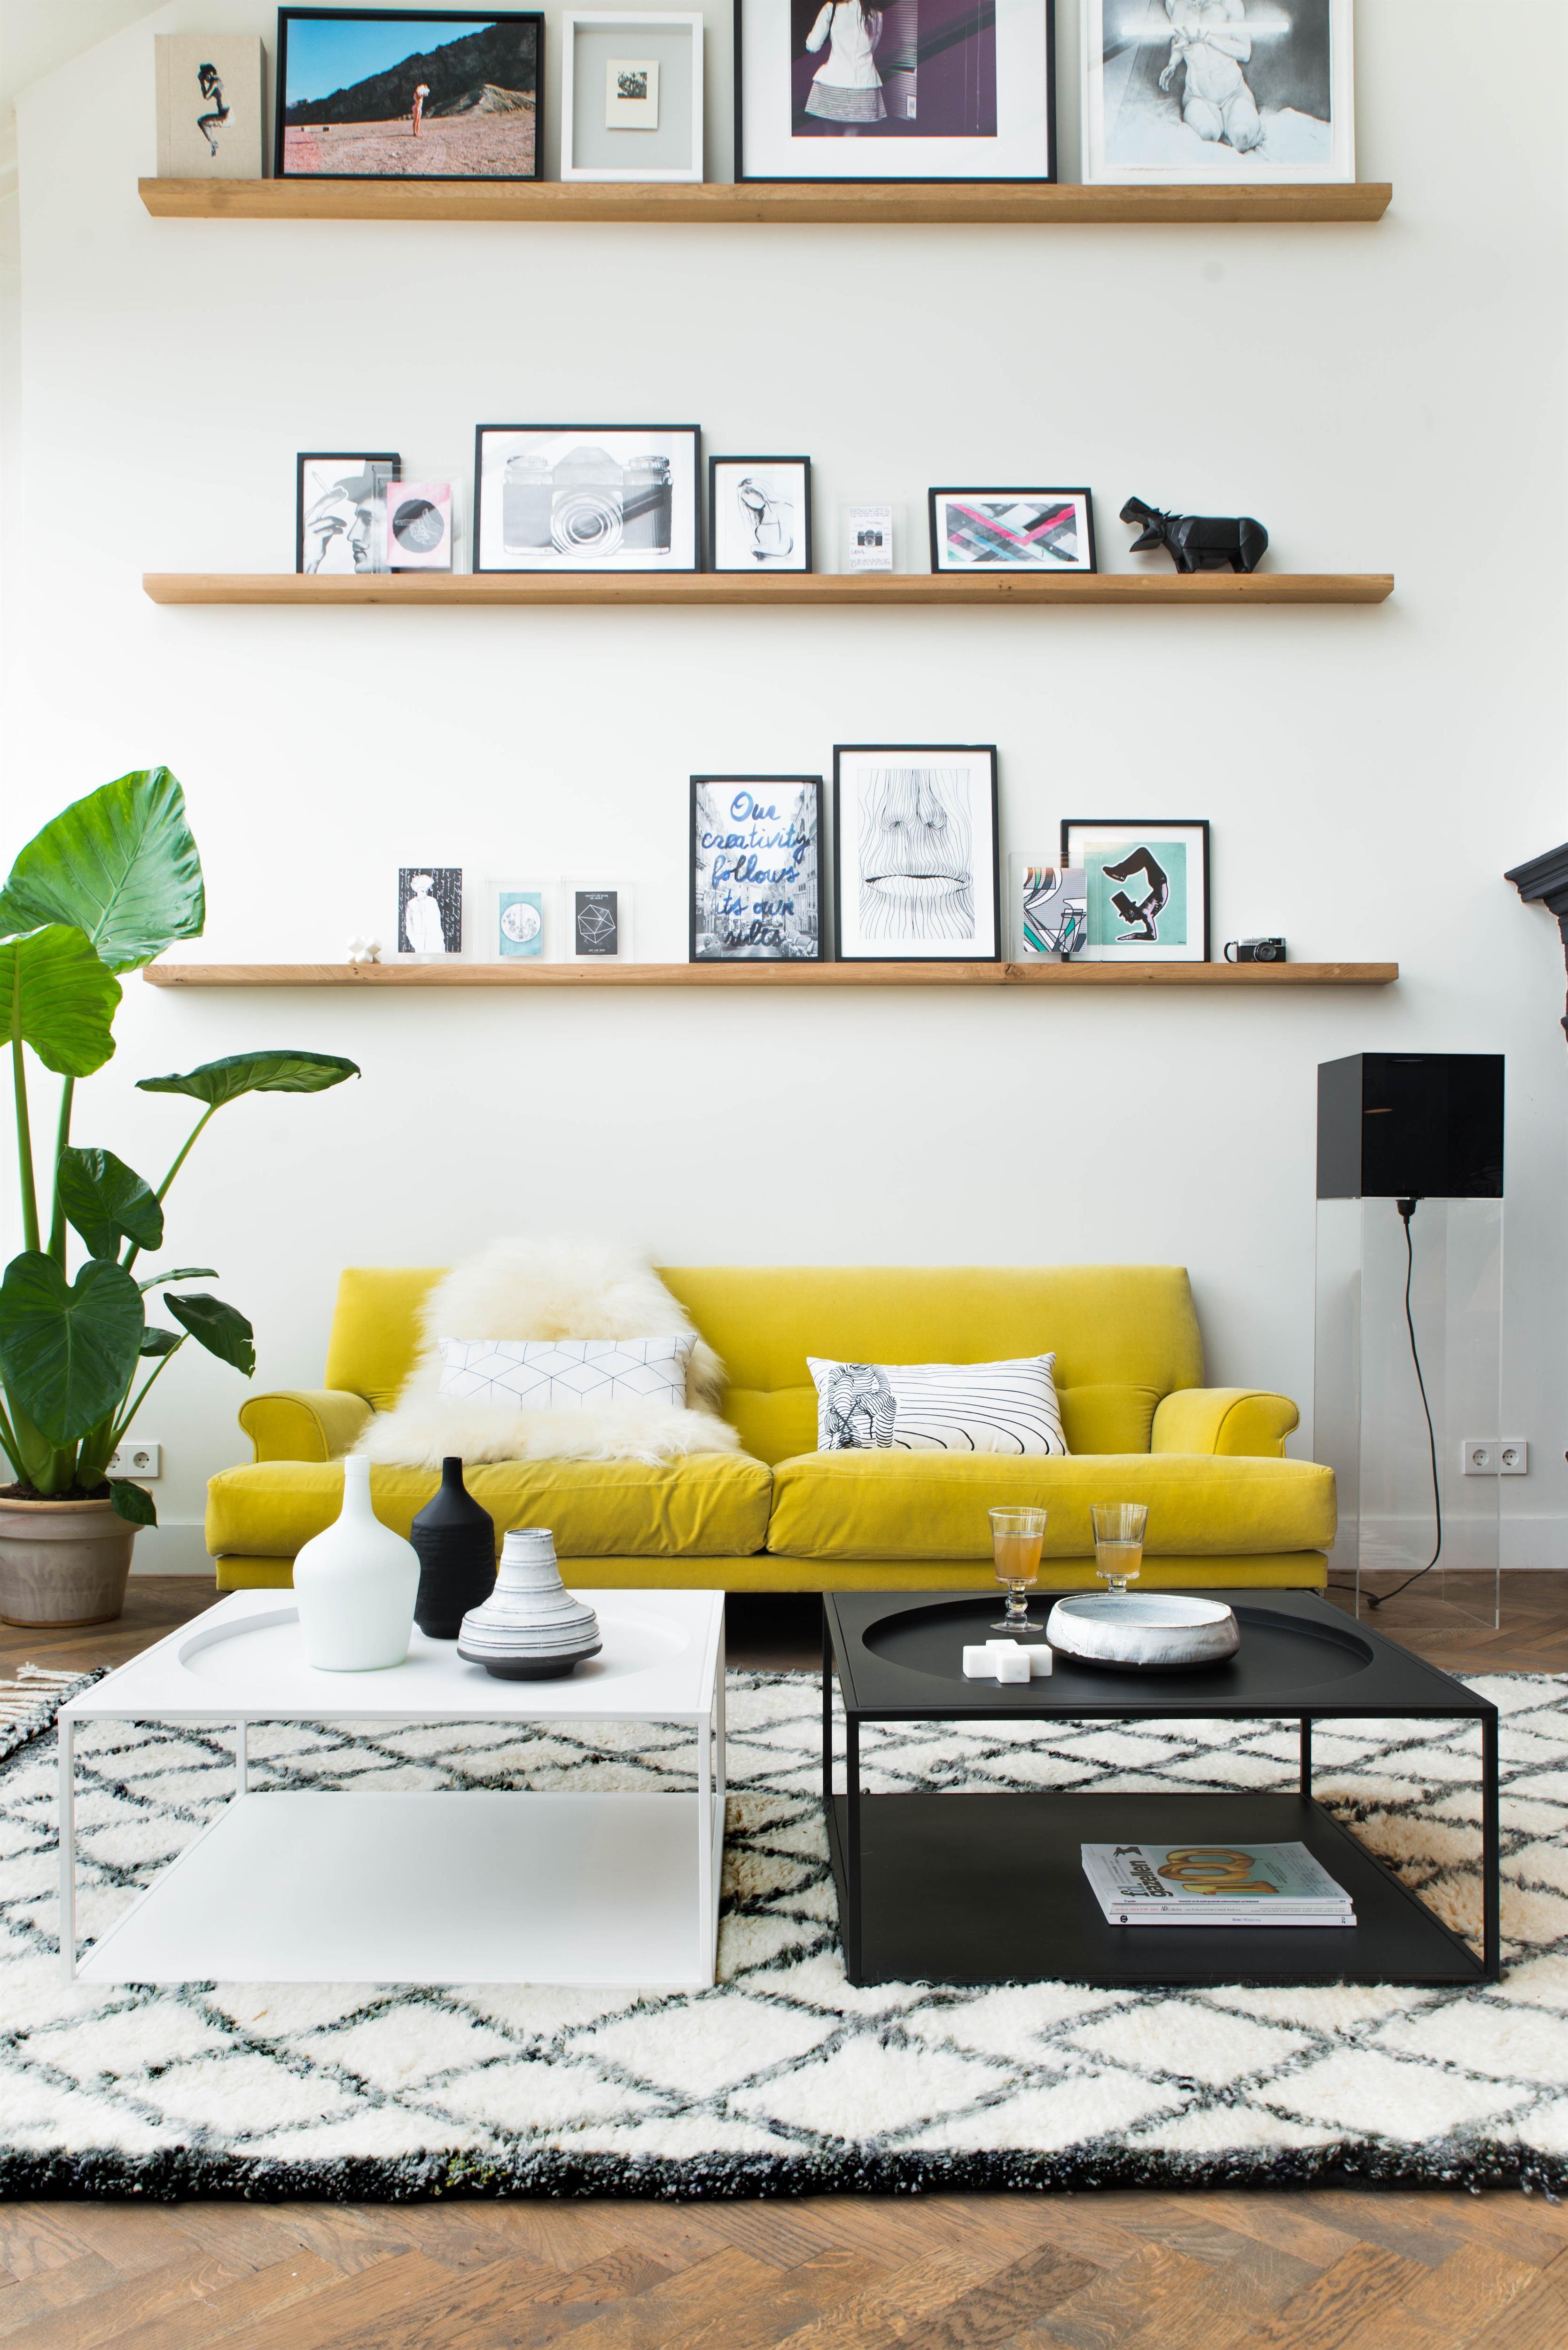 hkliving industrieel vintage kleur decoratie woonaccessoires woonkamer interieur wit zwart hout